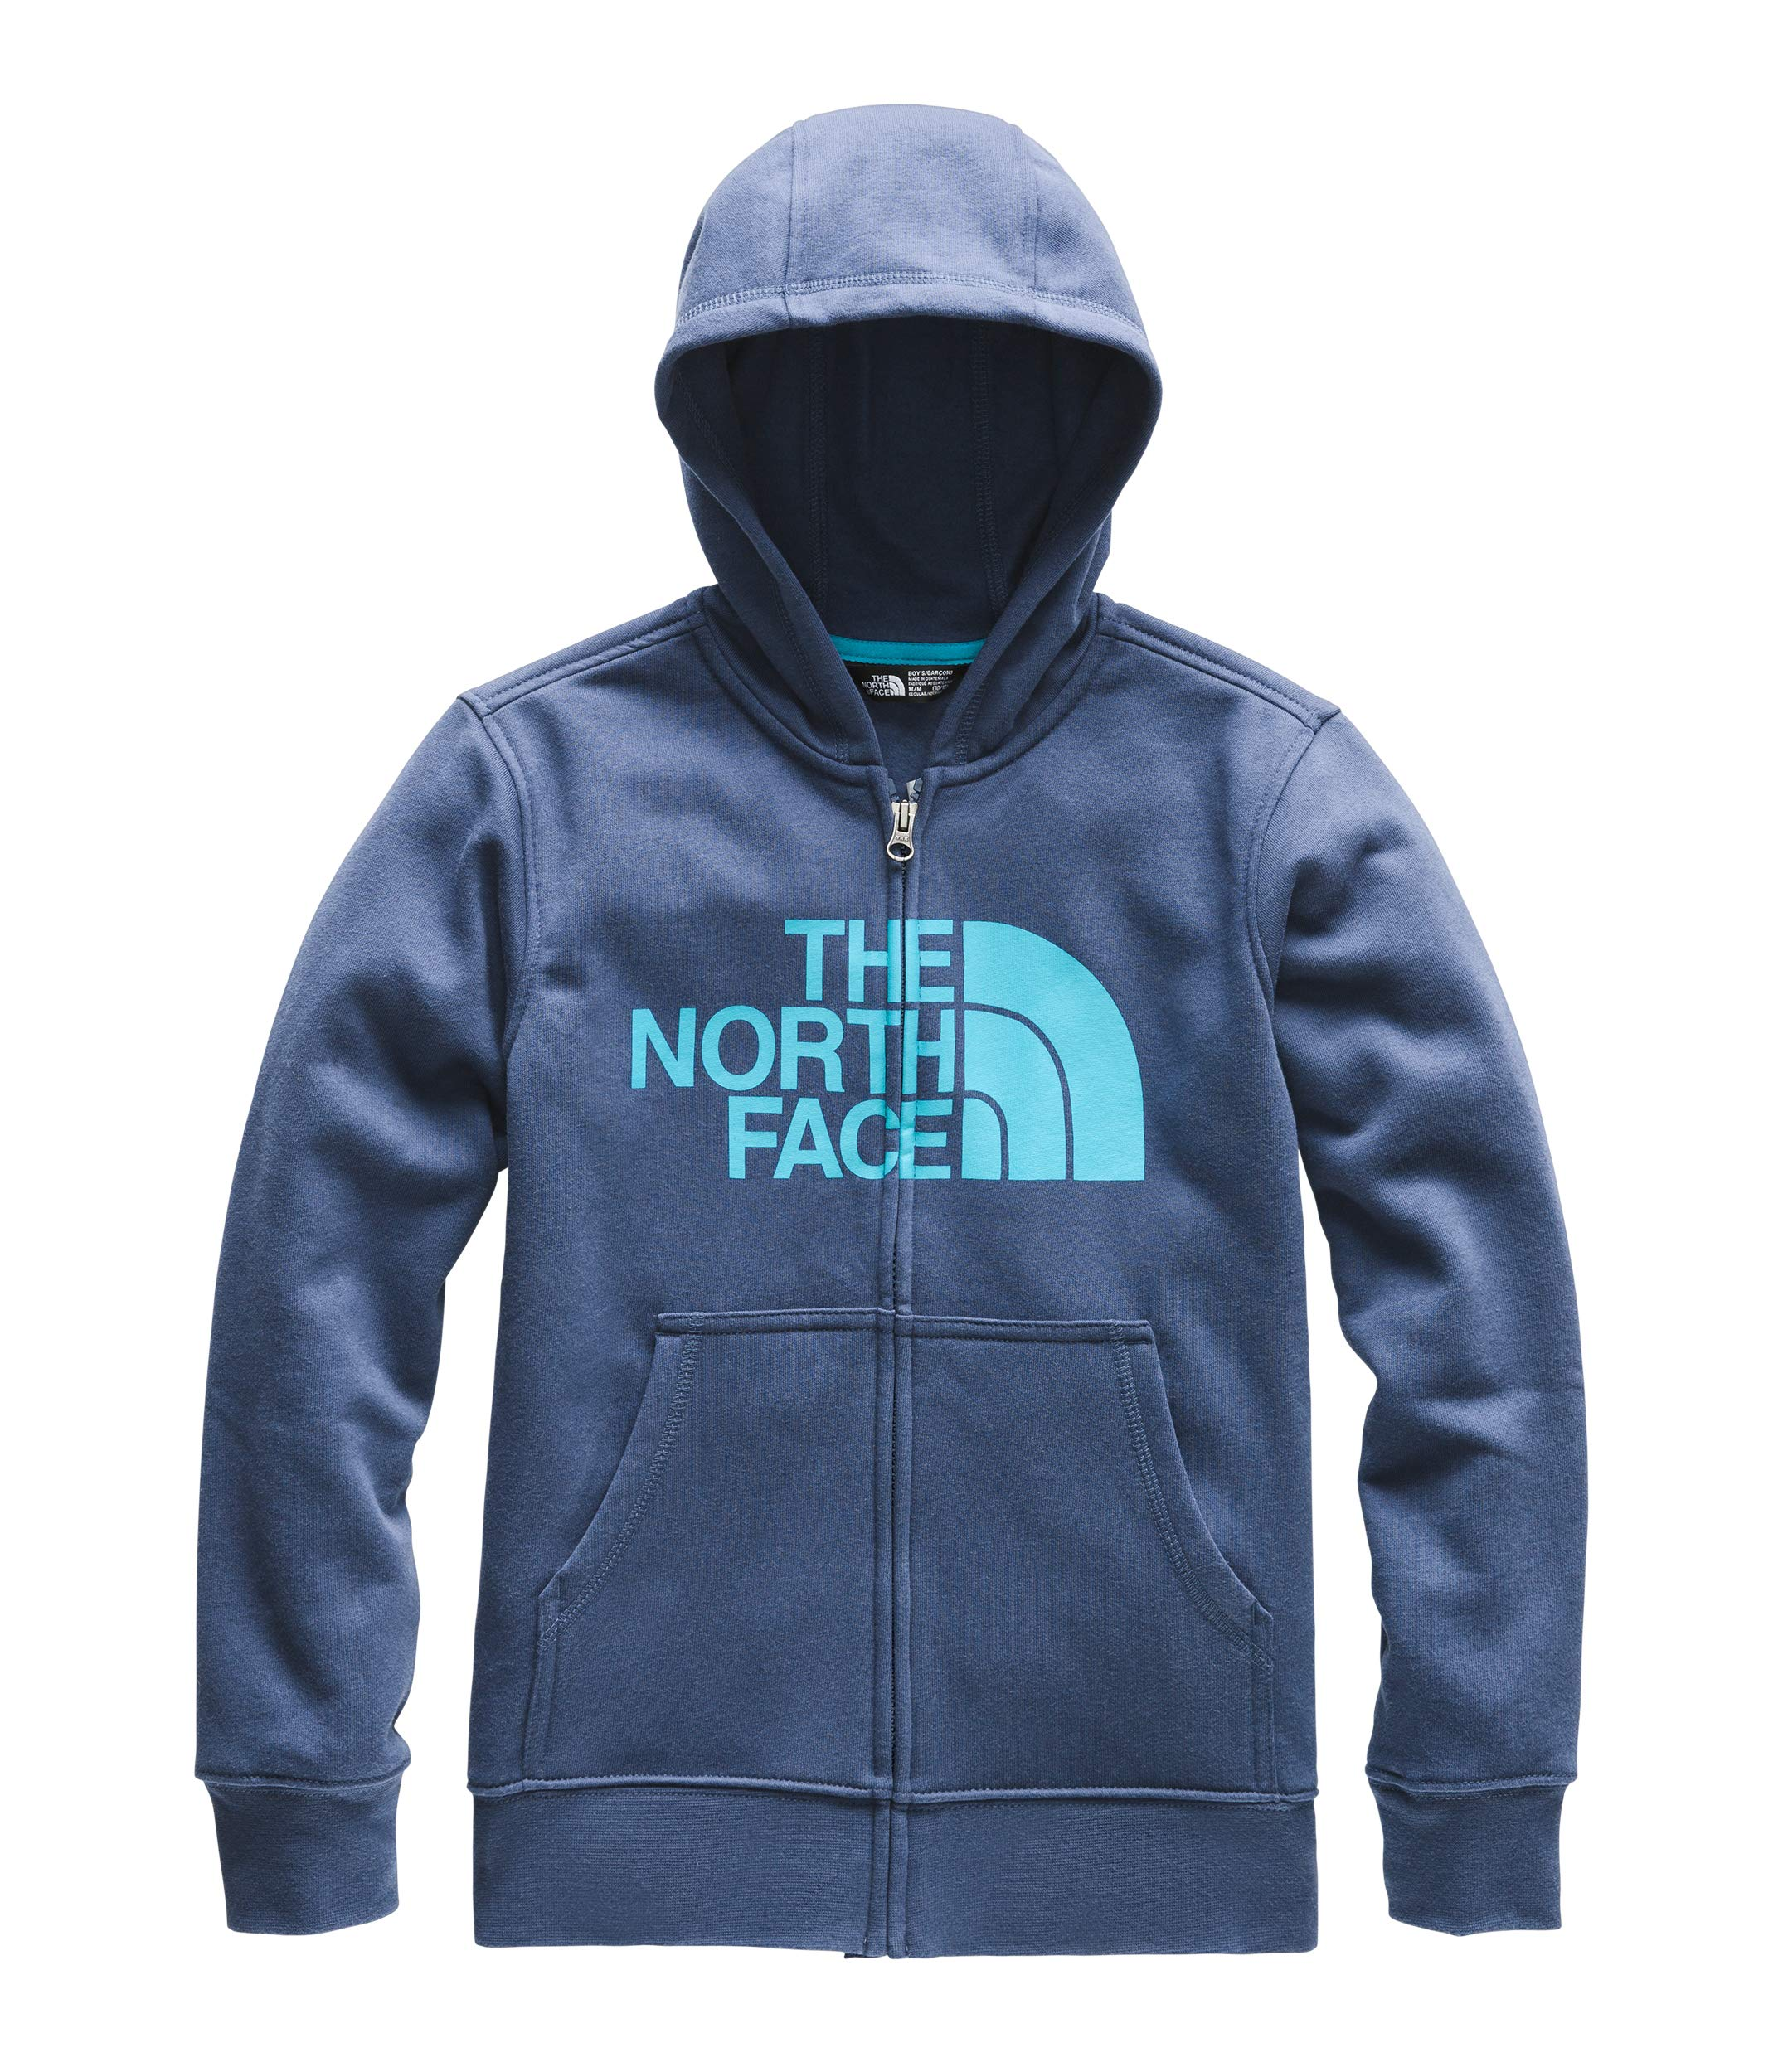 The North Face Kids Boy's Logowear Full Zip Hoodie (Little Kids/Big Kids) Shady Blue XX-Small